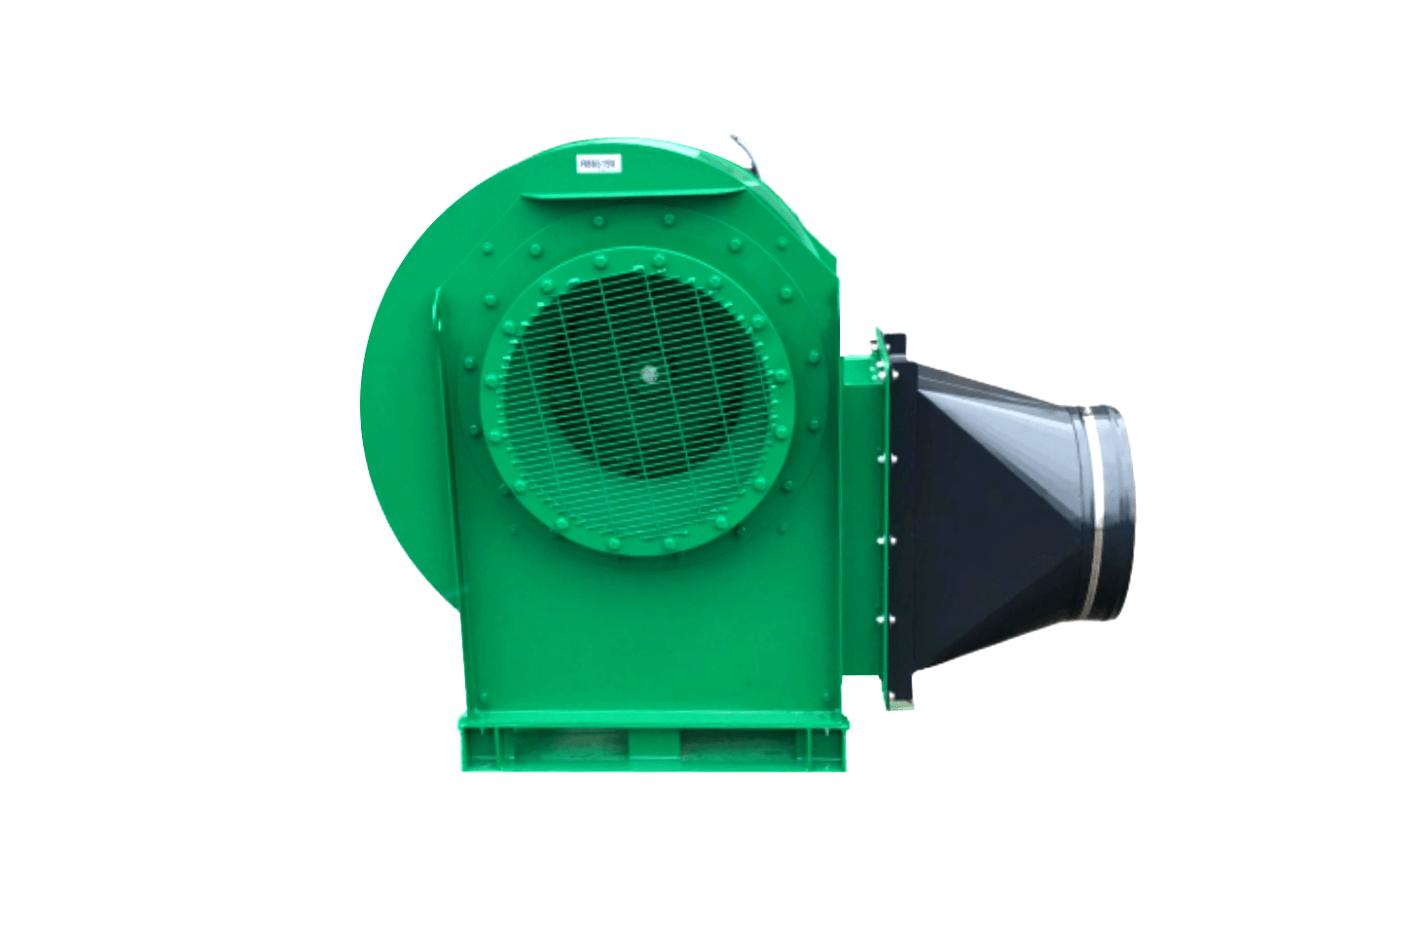 VENTEX Centrifugal Fan High Pressure Ventilation Unit